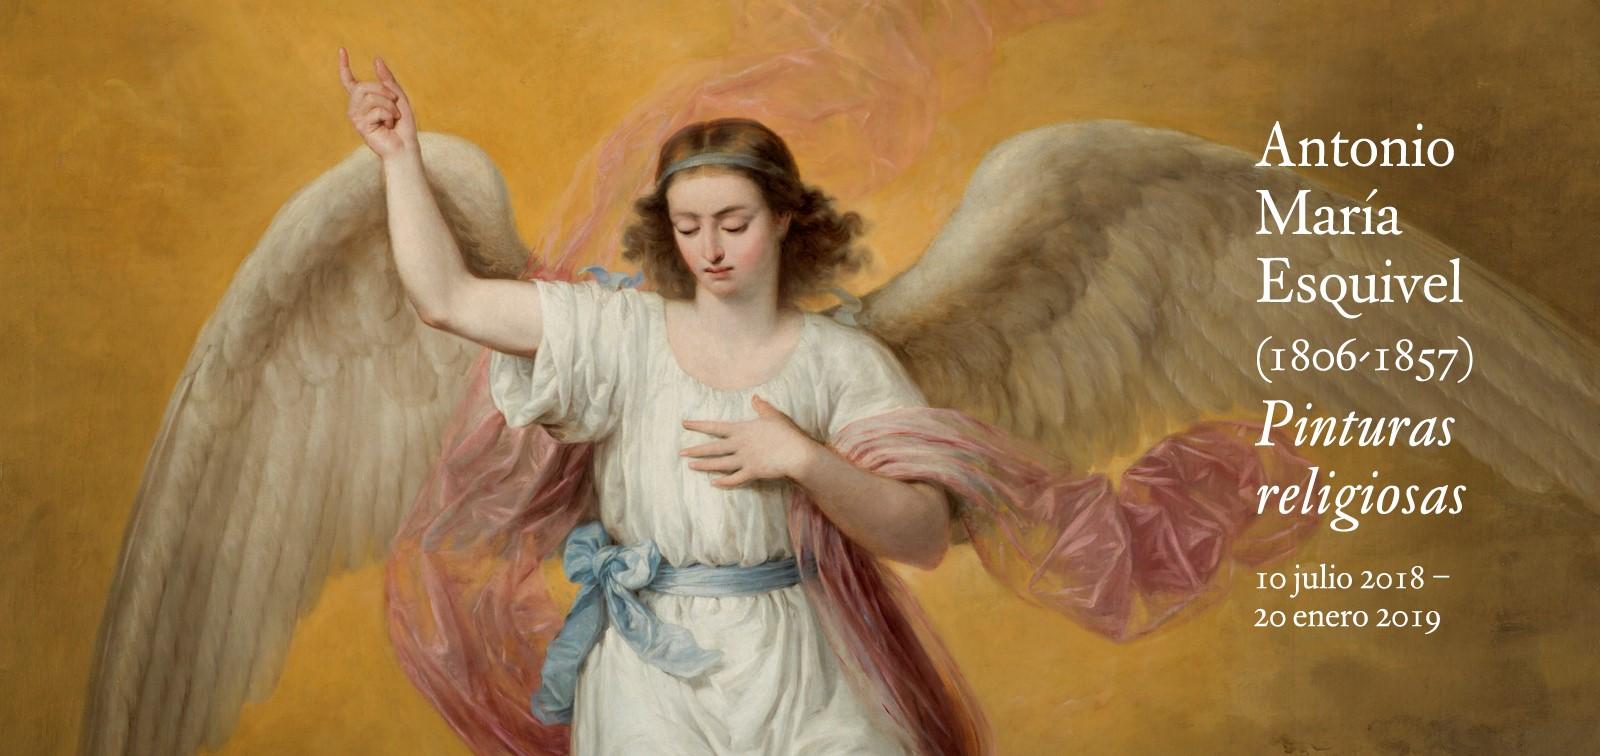 Exposición. Antonio María Esquivel (1806-1857): Pinturas religiosas